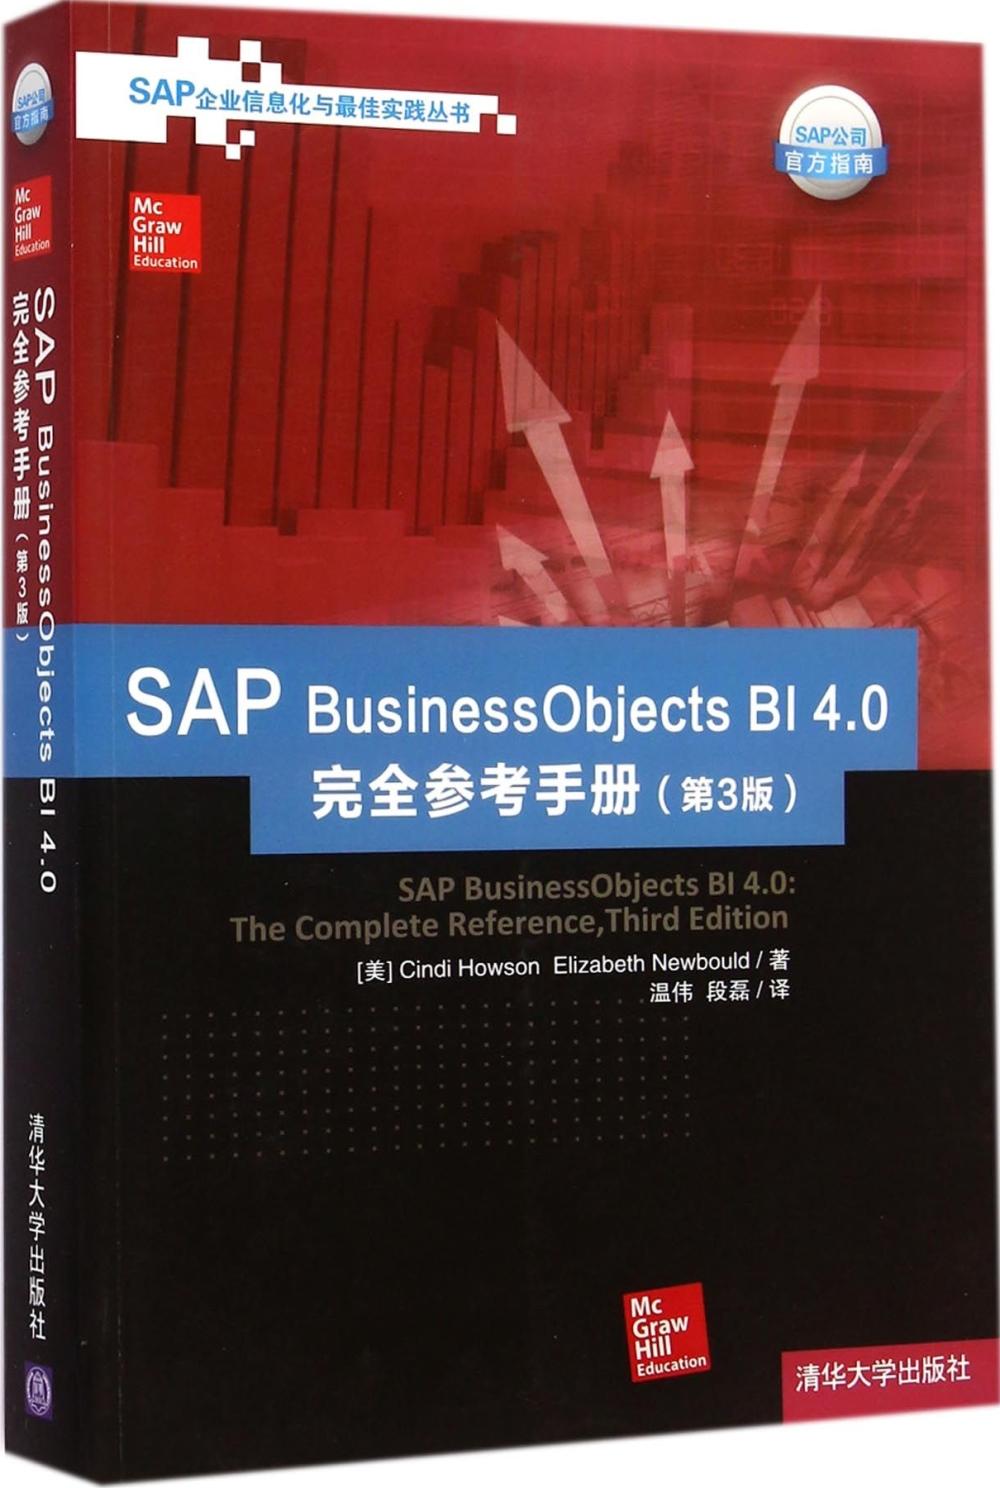 SAP BusinessObjects BI 4.0完全參考手冊^(第3版^)